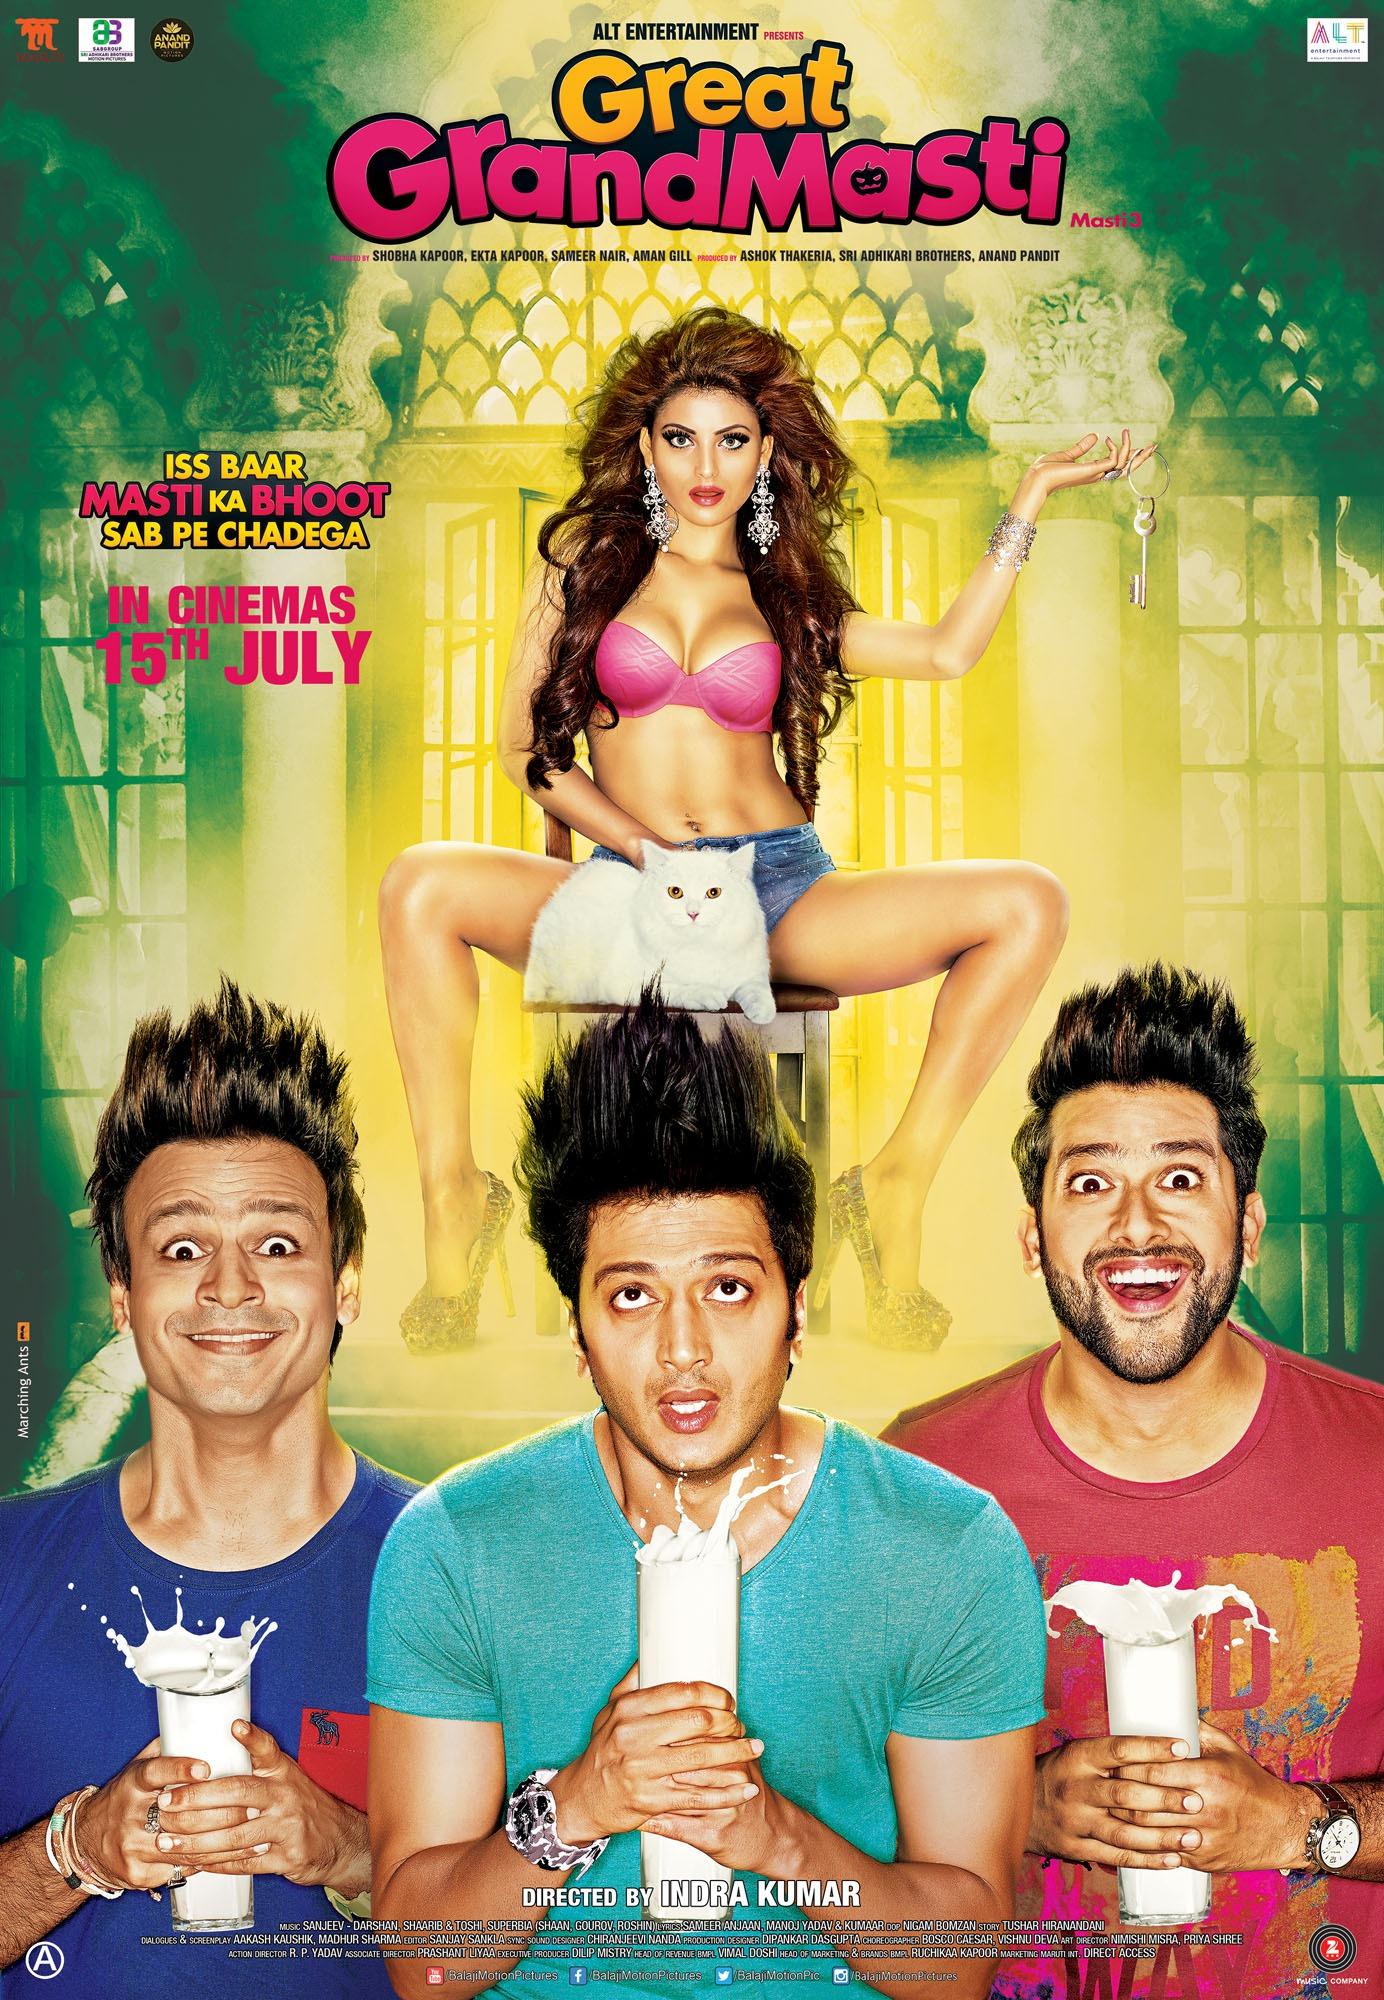 Great Grand Masti (2016) Hindi WEB-DL - 480P   720P - x264 - 300MB   950MB - Download & Watch Online  Movie Poster - mlsbd